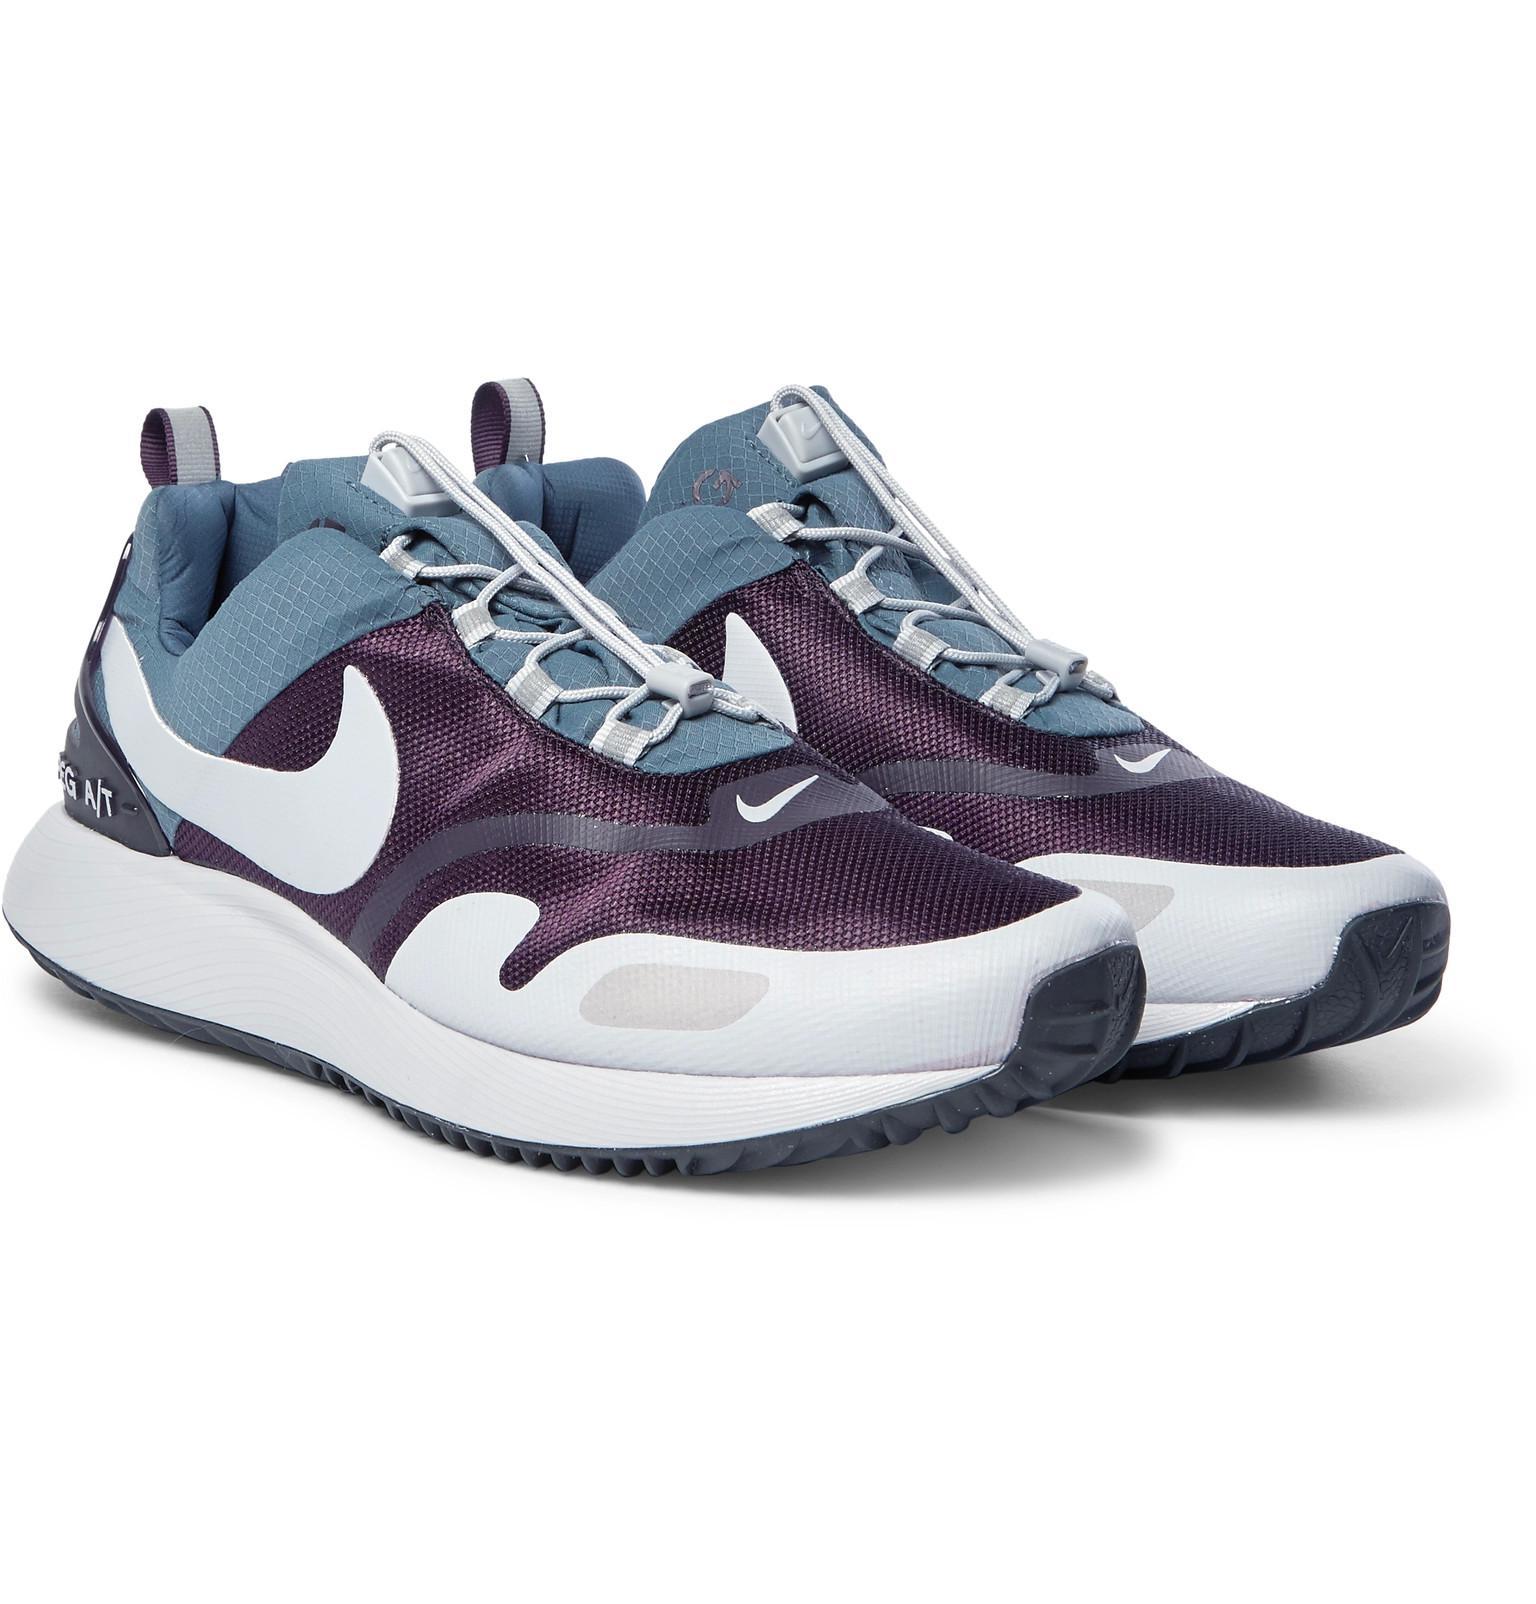 Air Pegasus At Ripstop And Shell Sneakers Nike U6ifdyYP